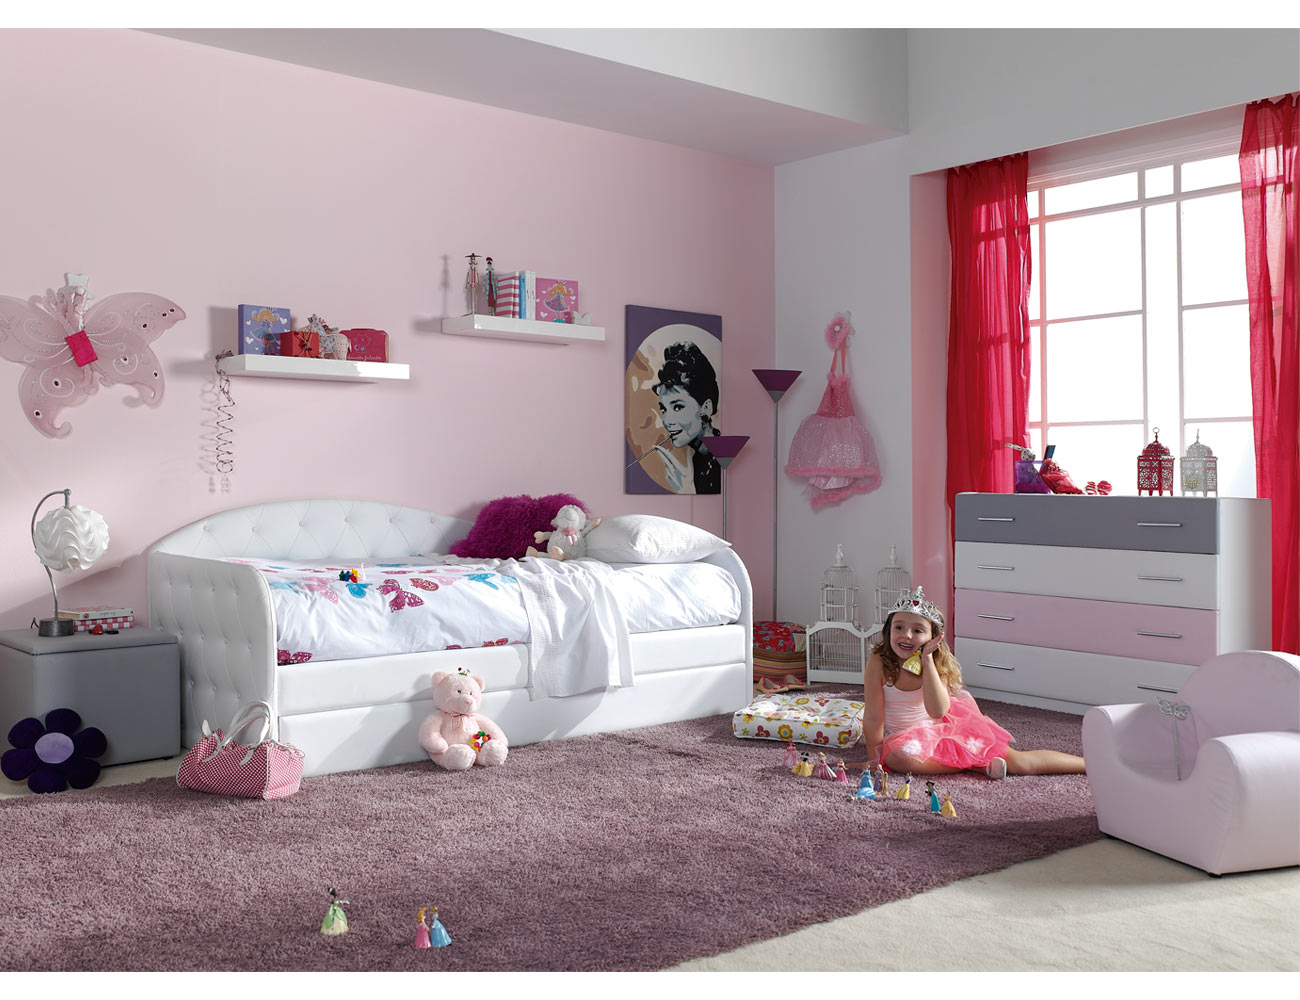 243 cama nido22